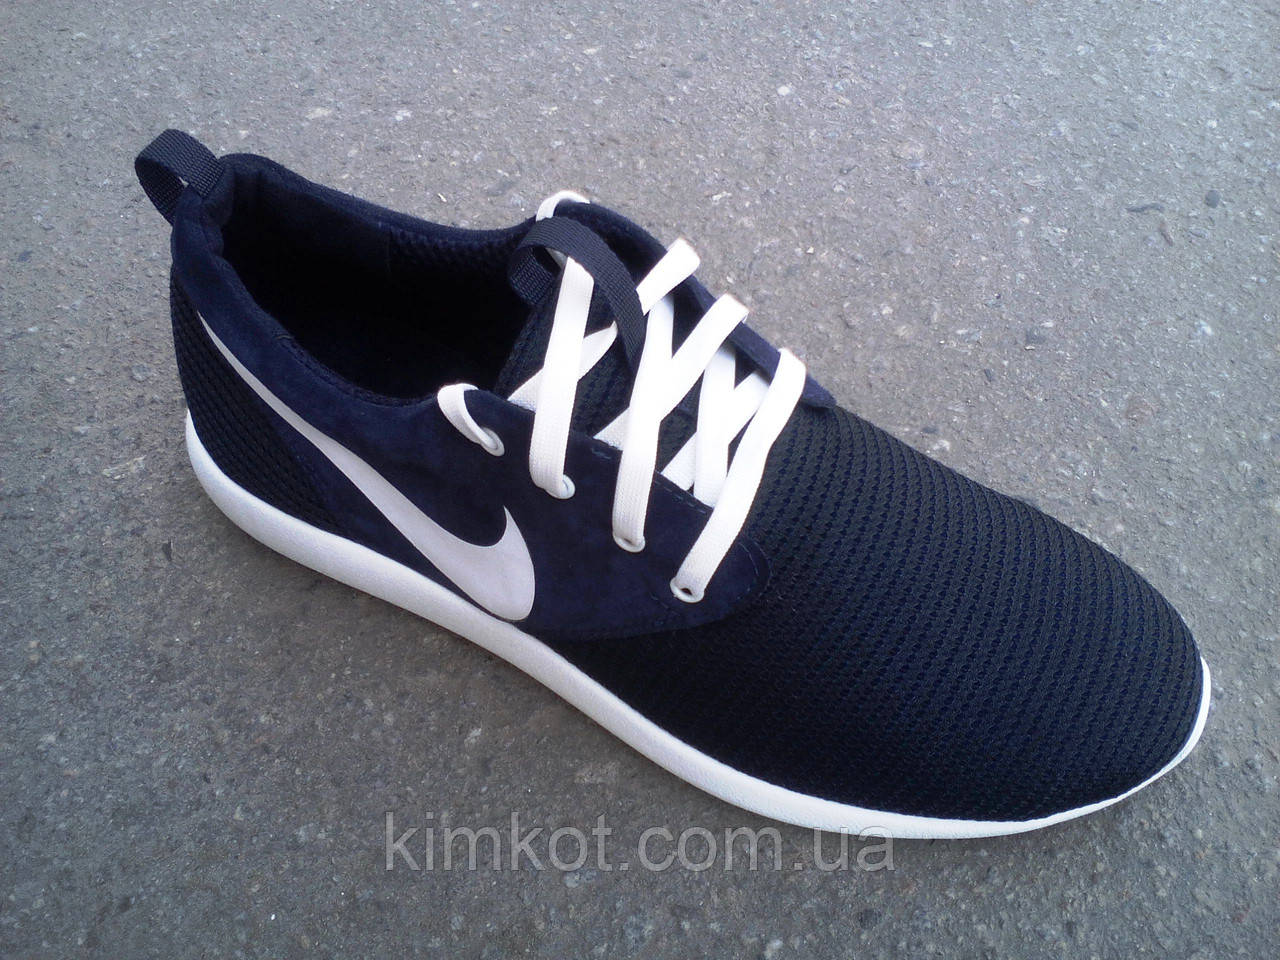 2b7eeef6a0a5 Кроссовки мужские сетка Nike Roshe Ran 40 -45 р-р - Интернет-Магазин